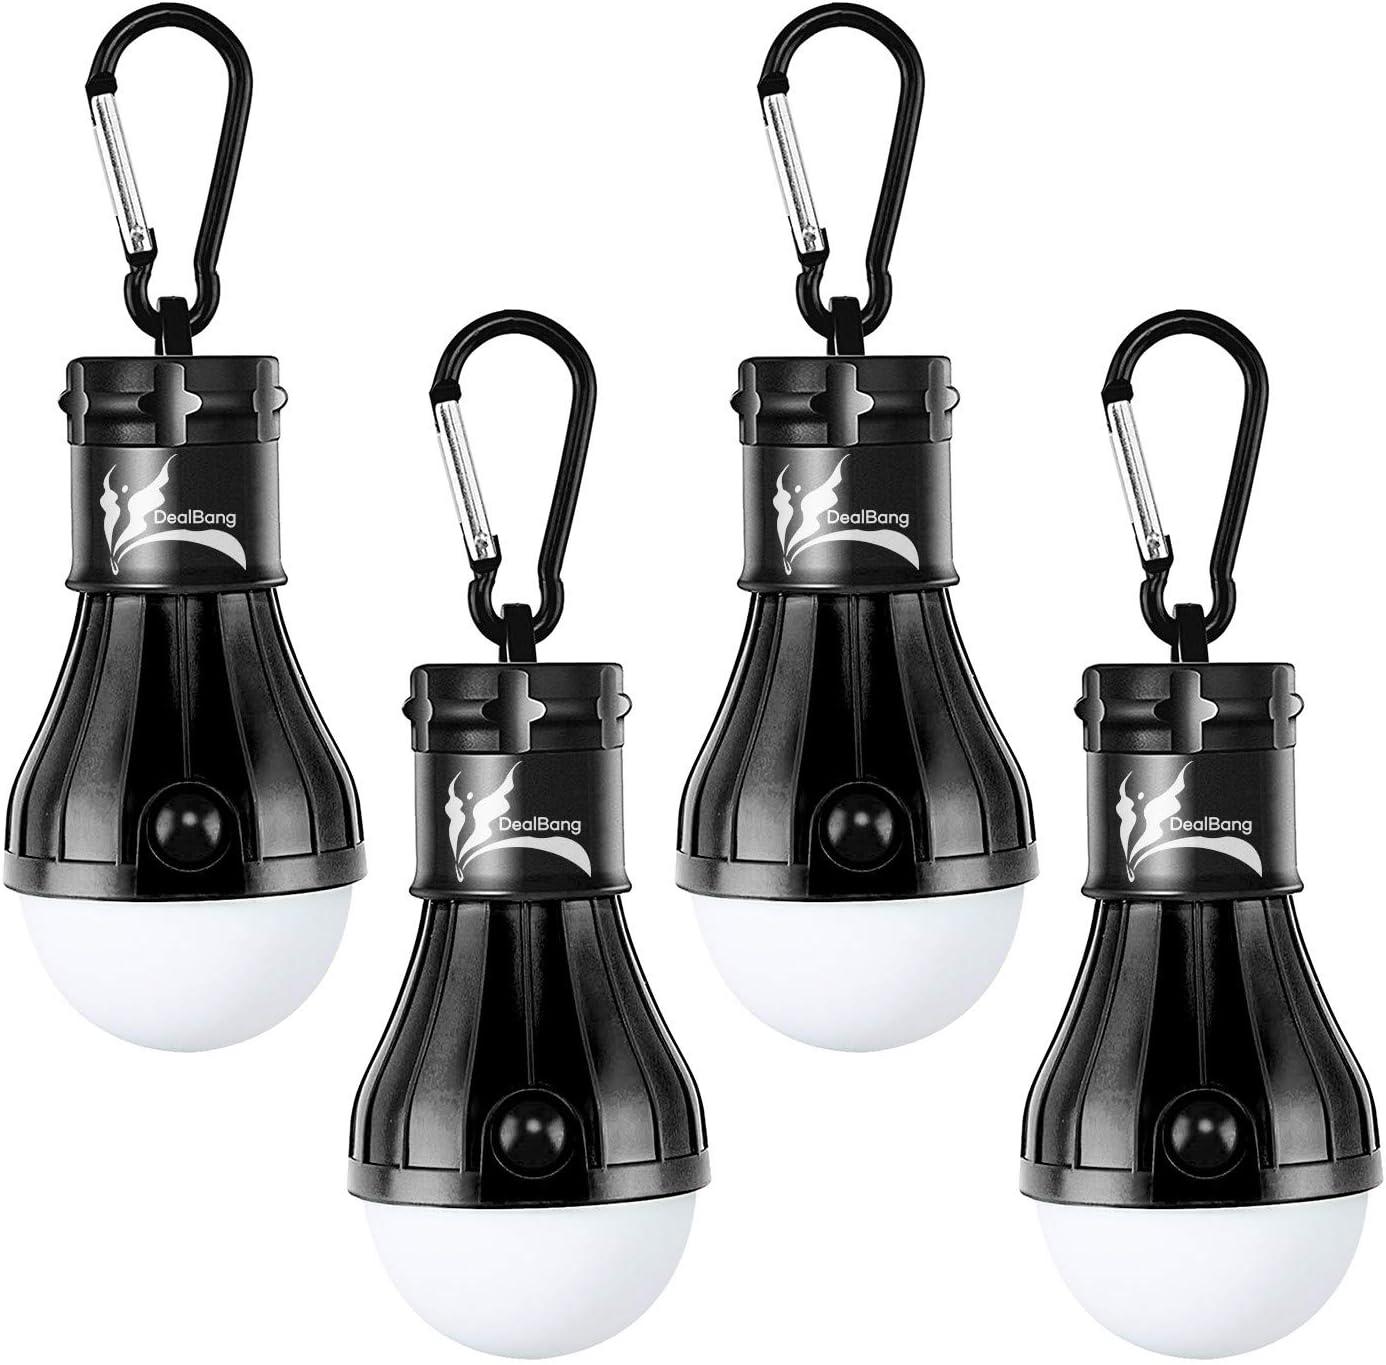 Portable LED Lamp DC 12V Bulb 3-6-9-12-15-18W Outdoor Tent Camp Fishing Lighting